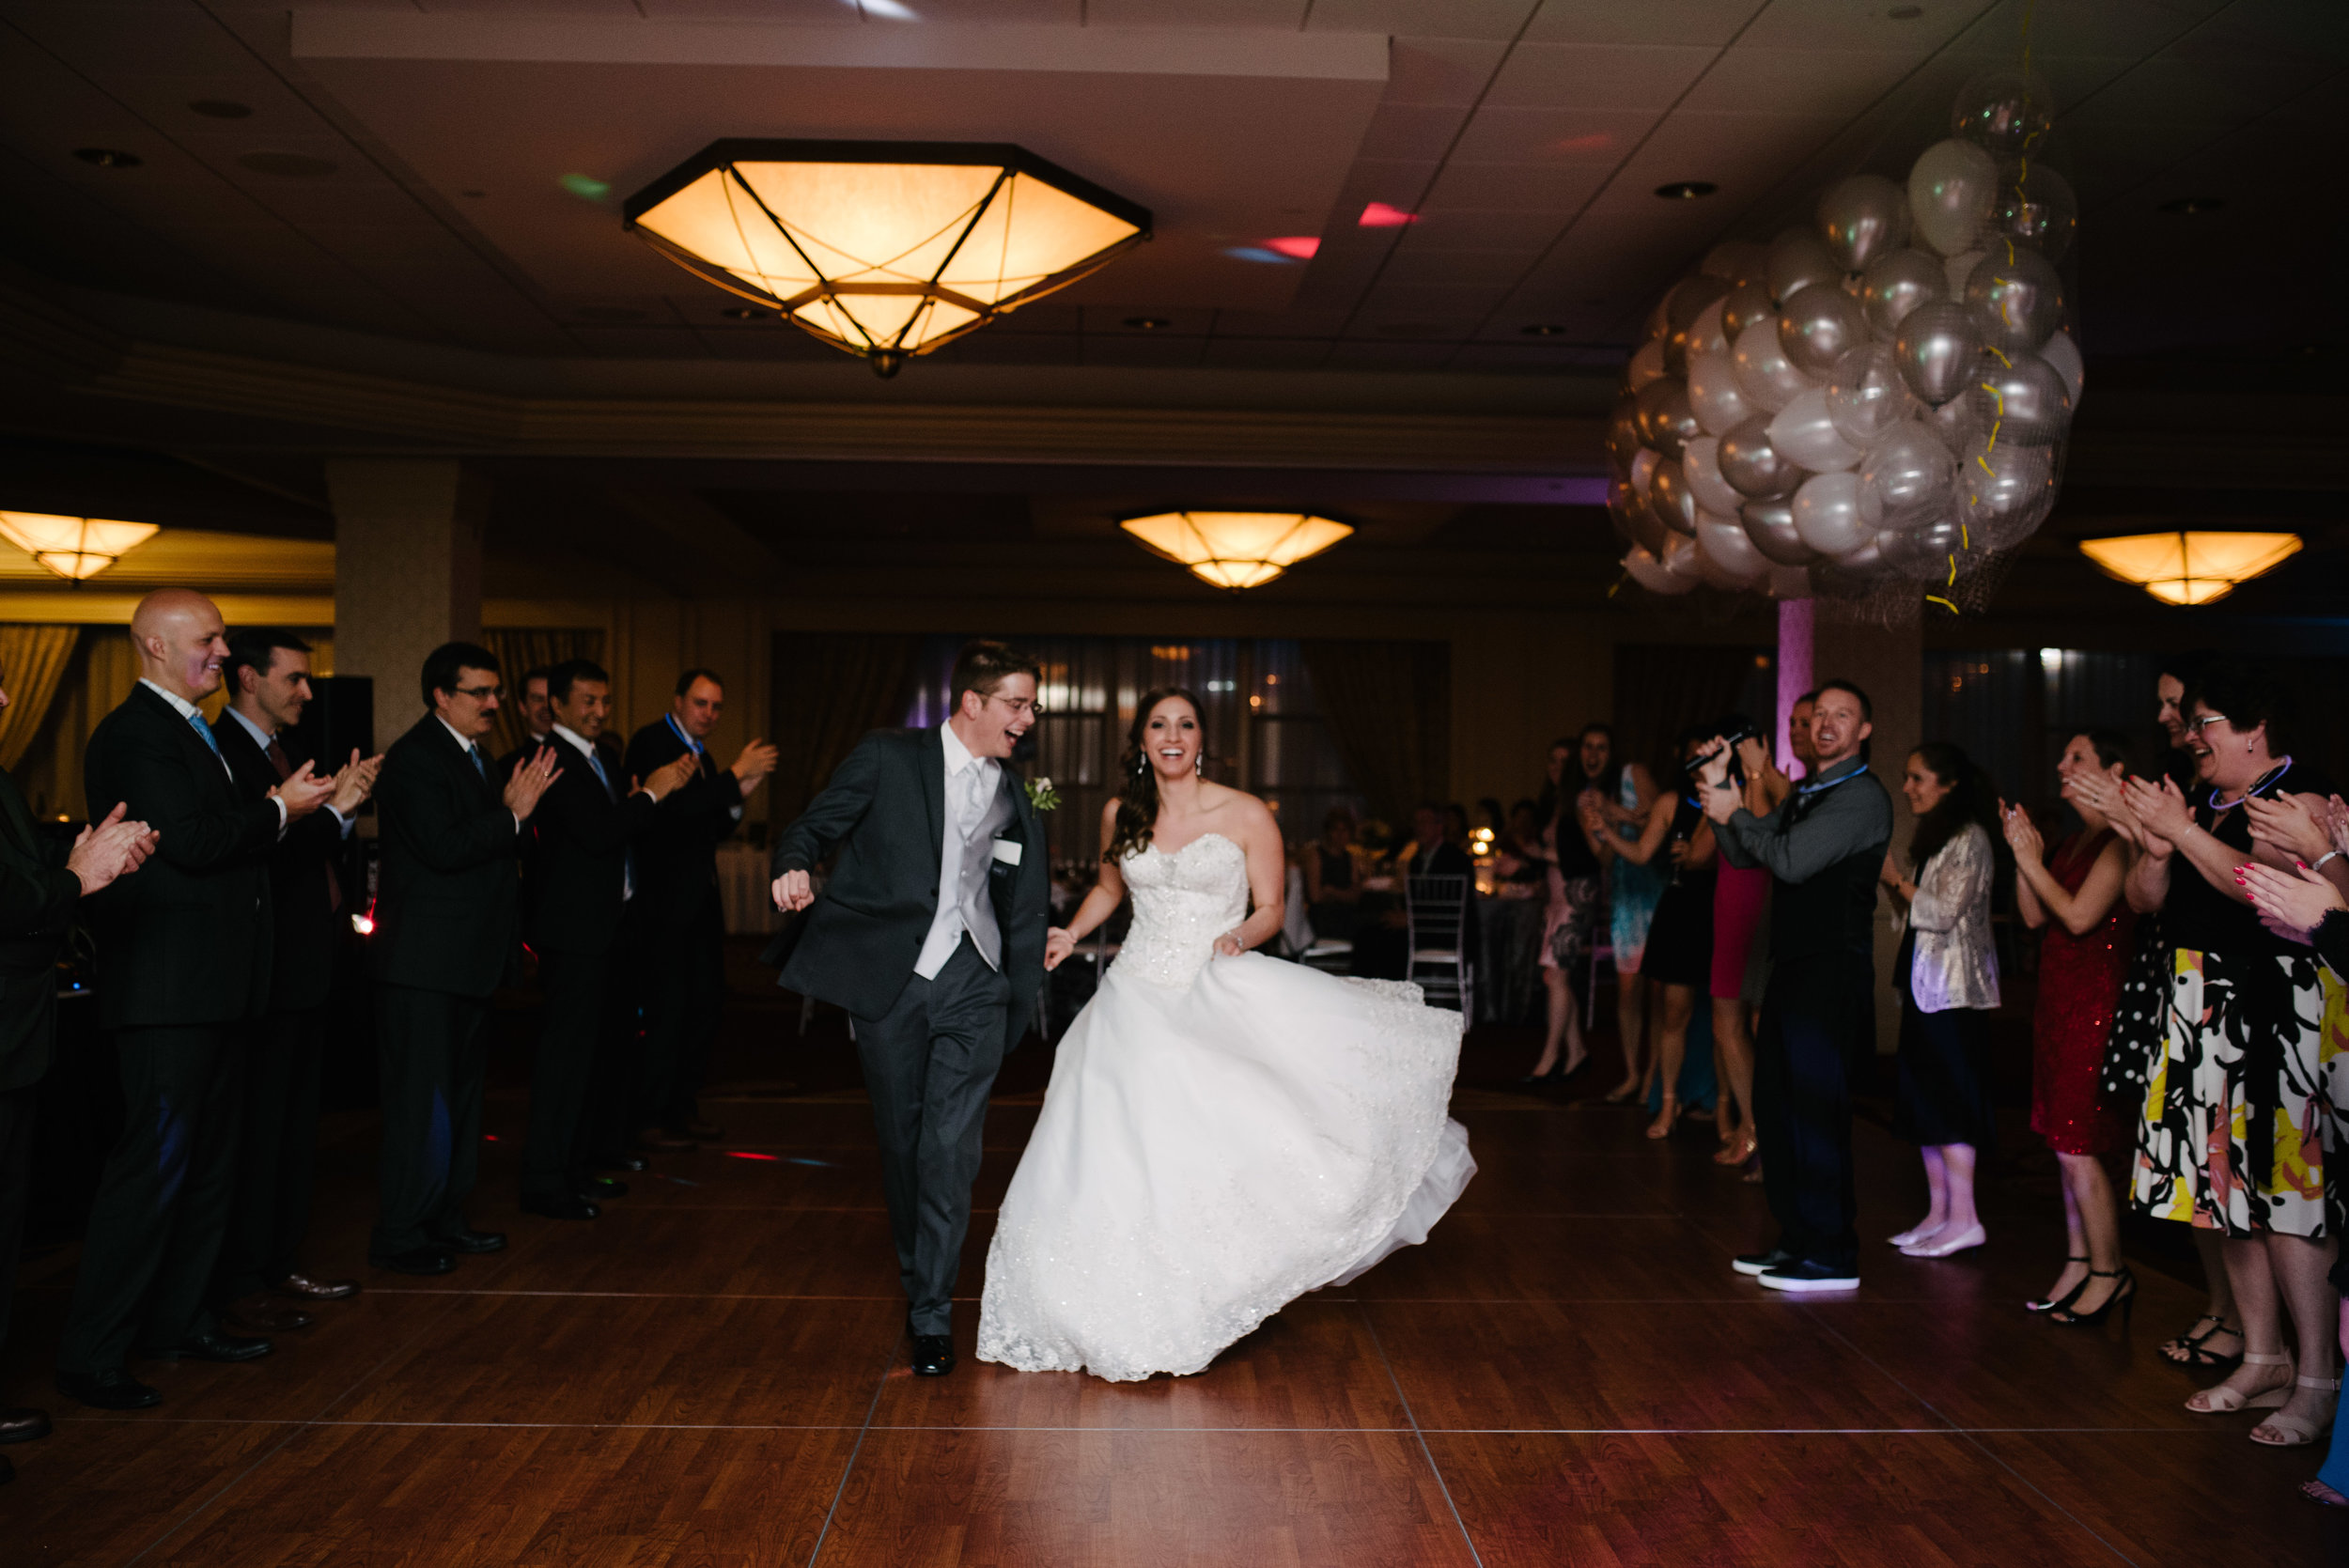 First dance ballroom reception // The Miner Details weddings